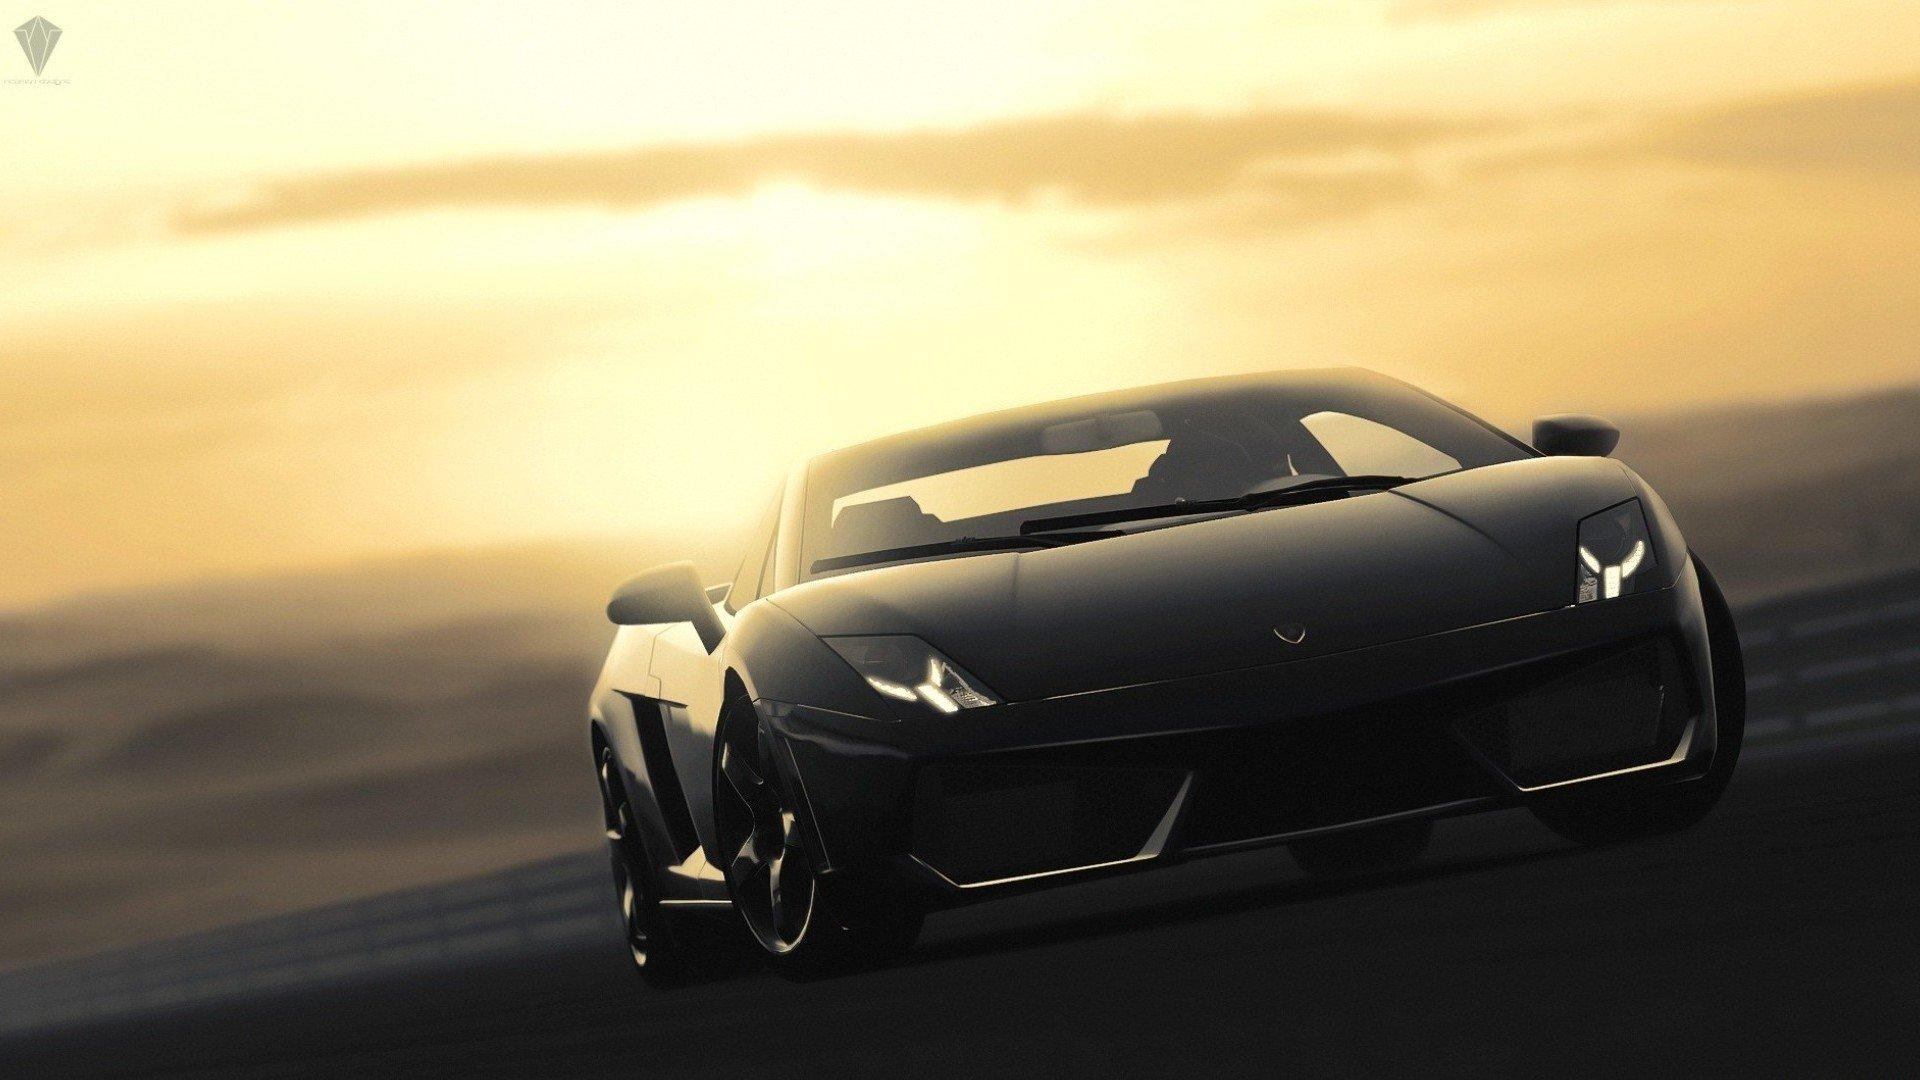 Download Full Hd 1080p Lamborghini Gallardo Pc Wallpaper Id 293094